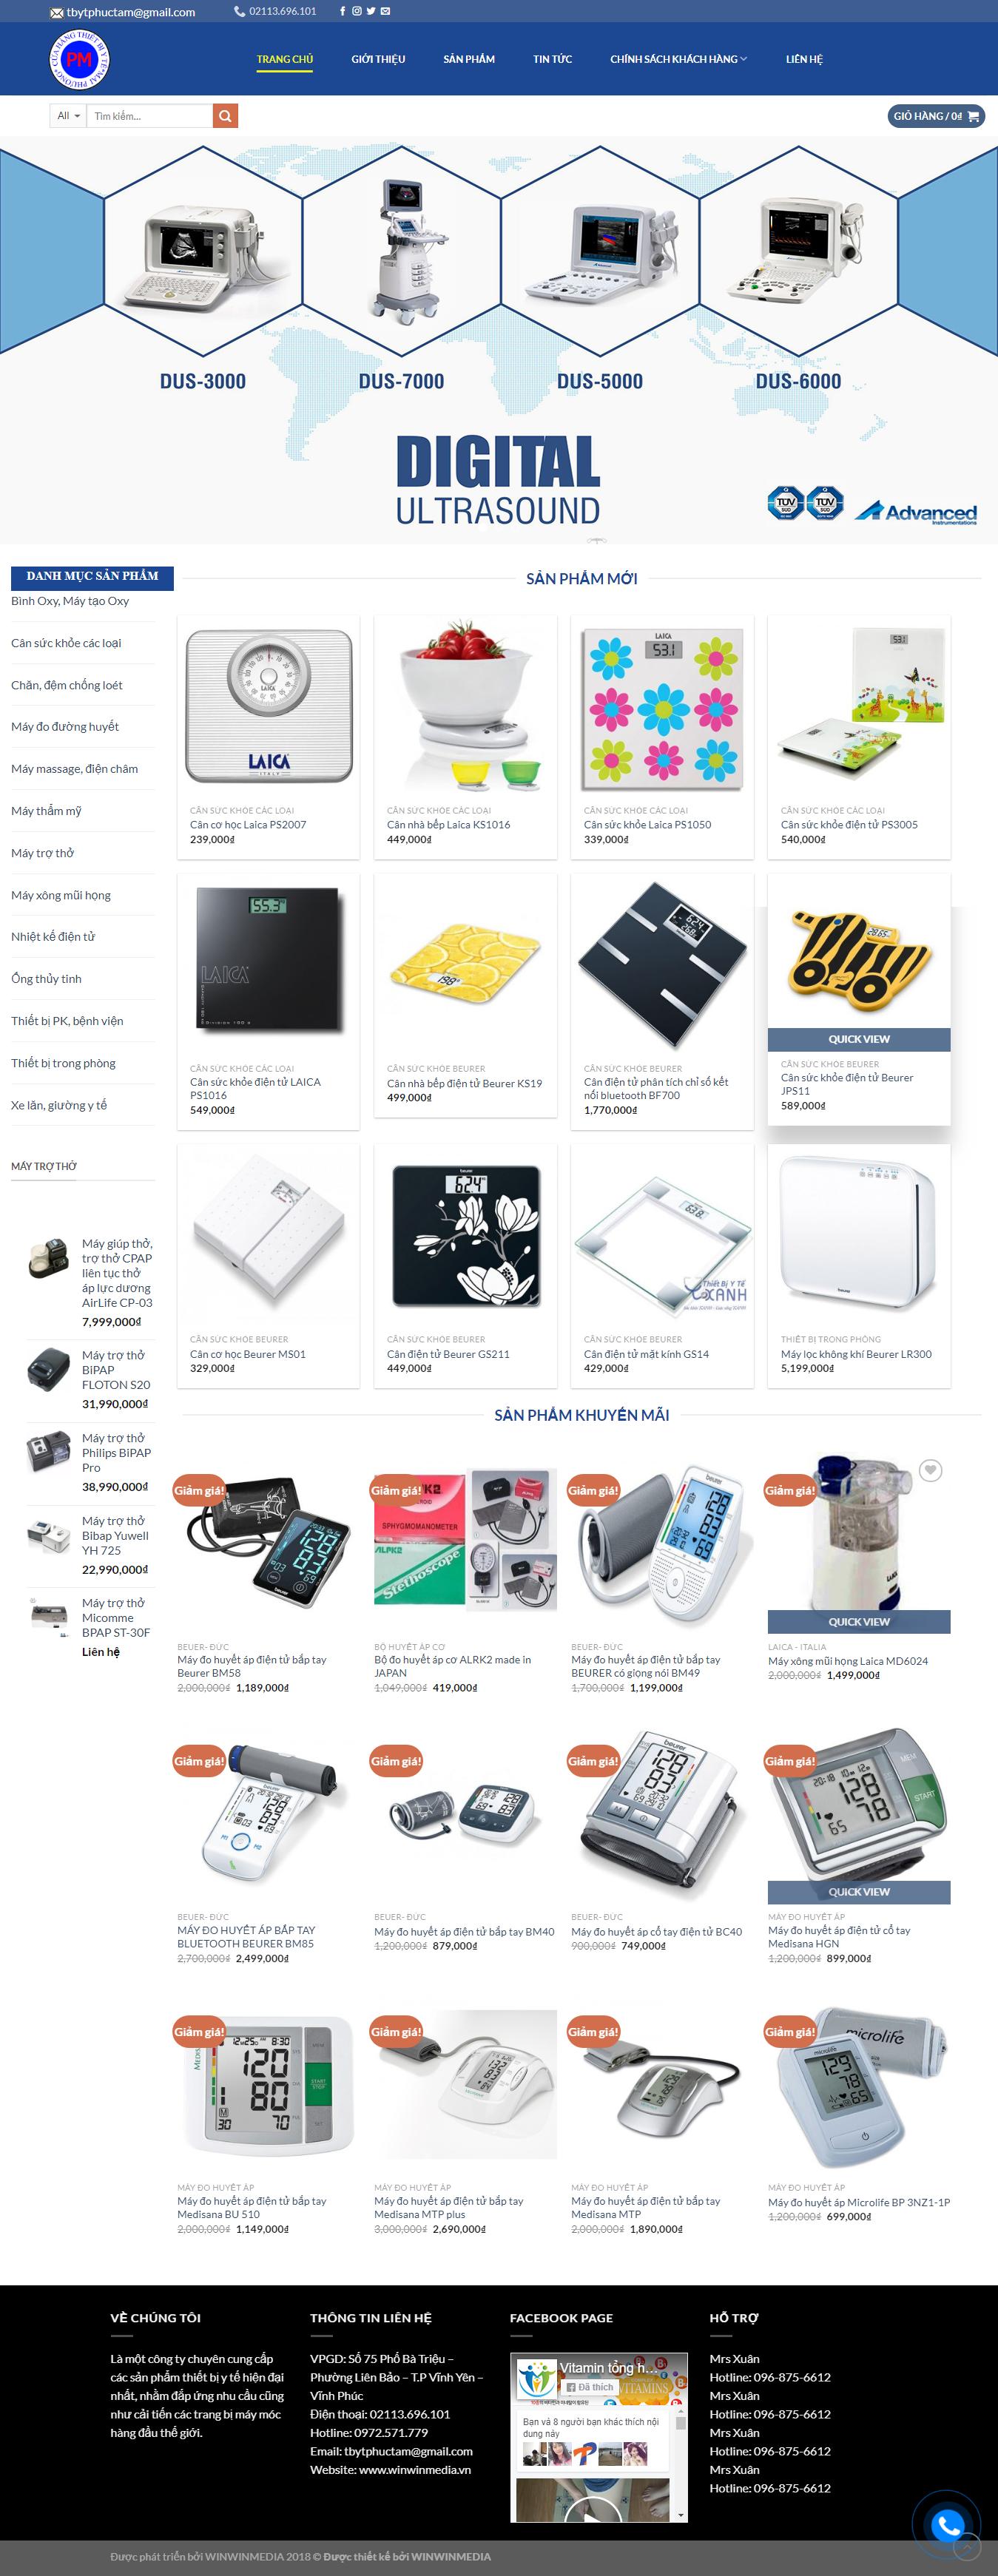 Mẫu website bán thiết bị y tế